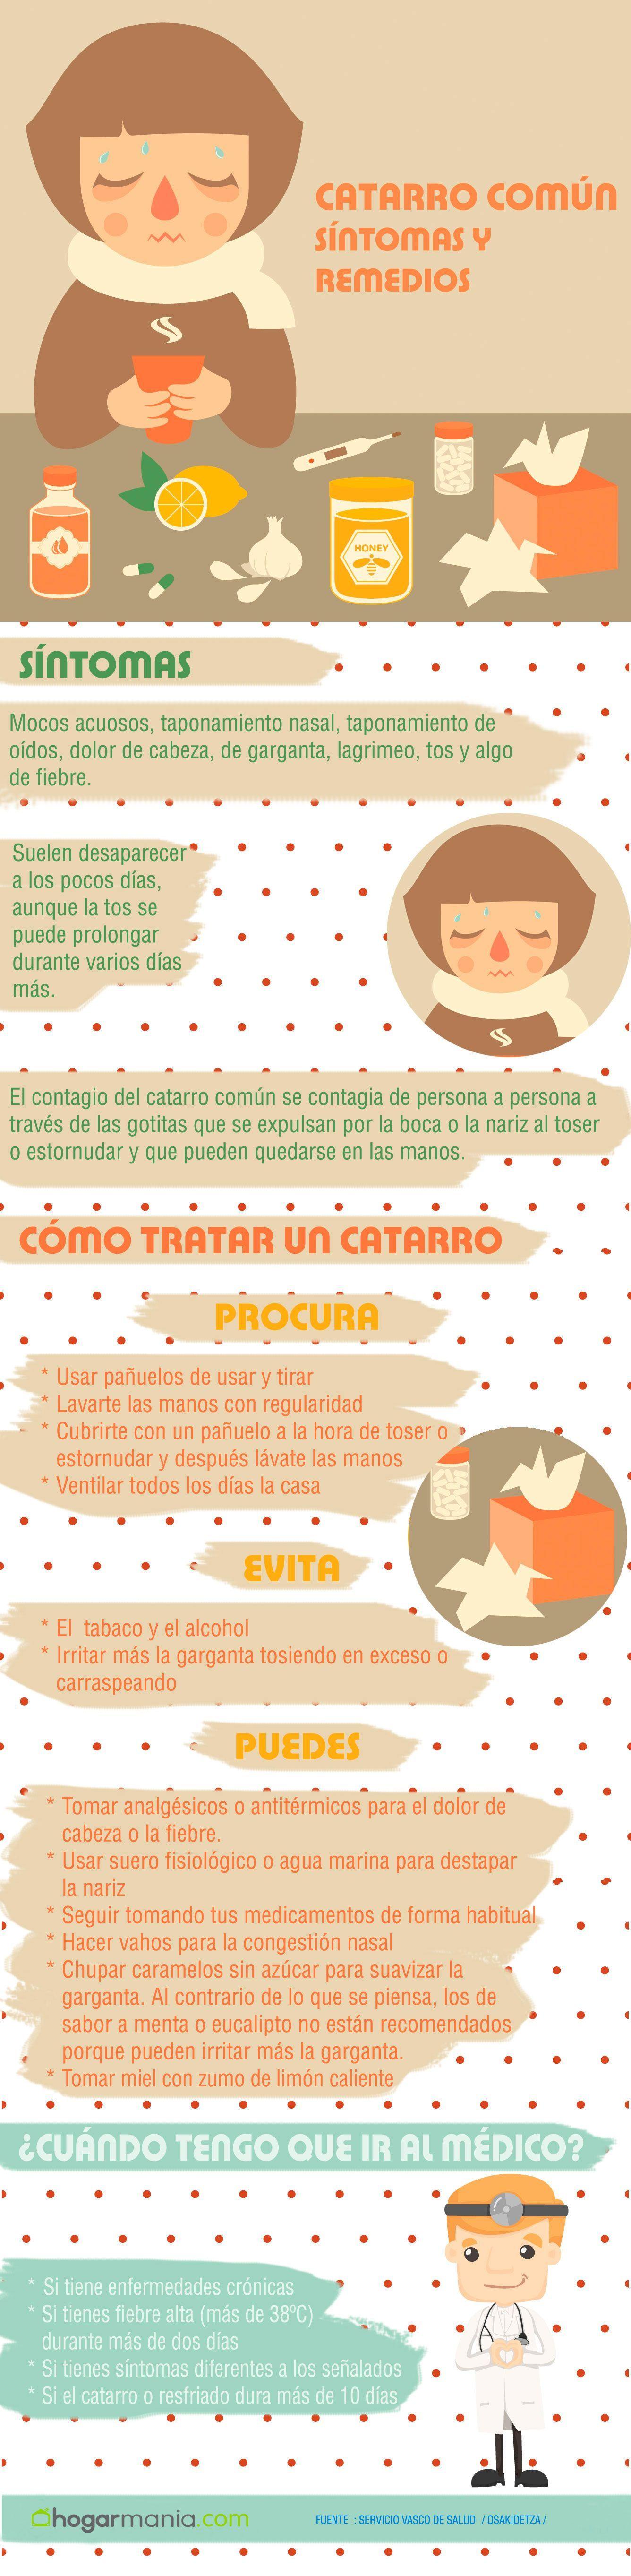 Image result for infografía de catarro Salud, Infografia